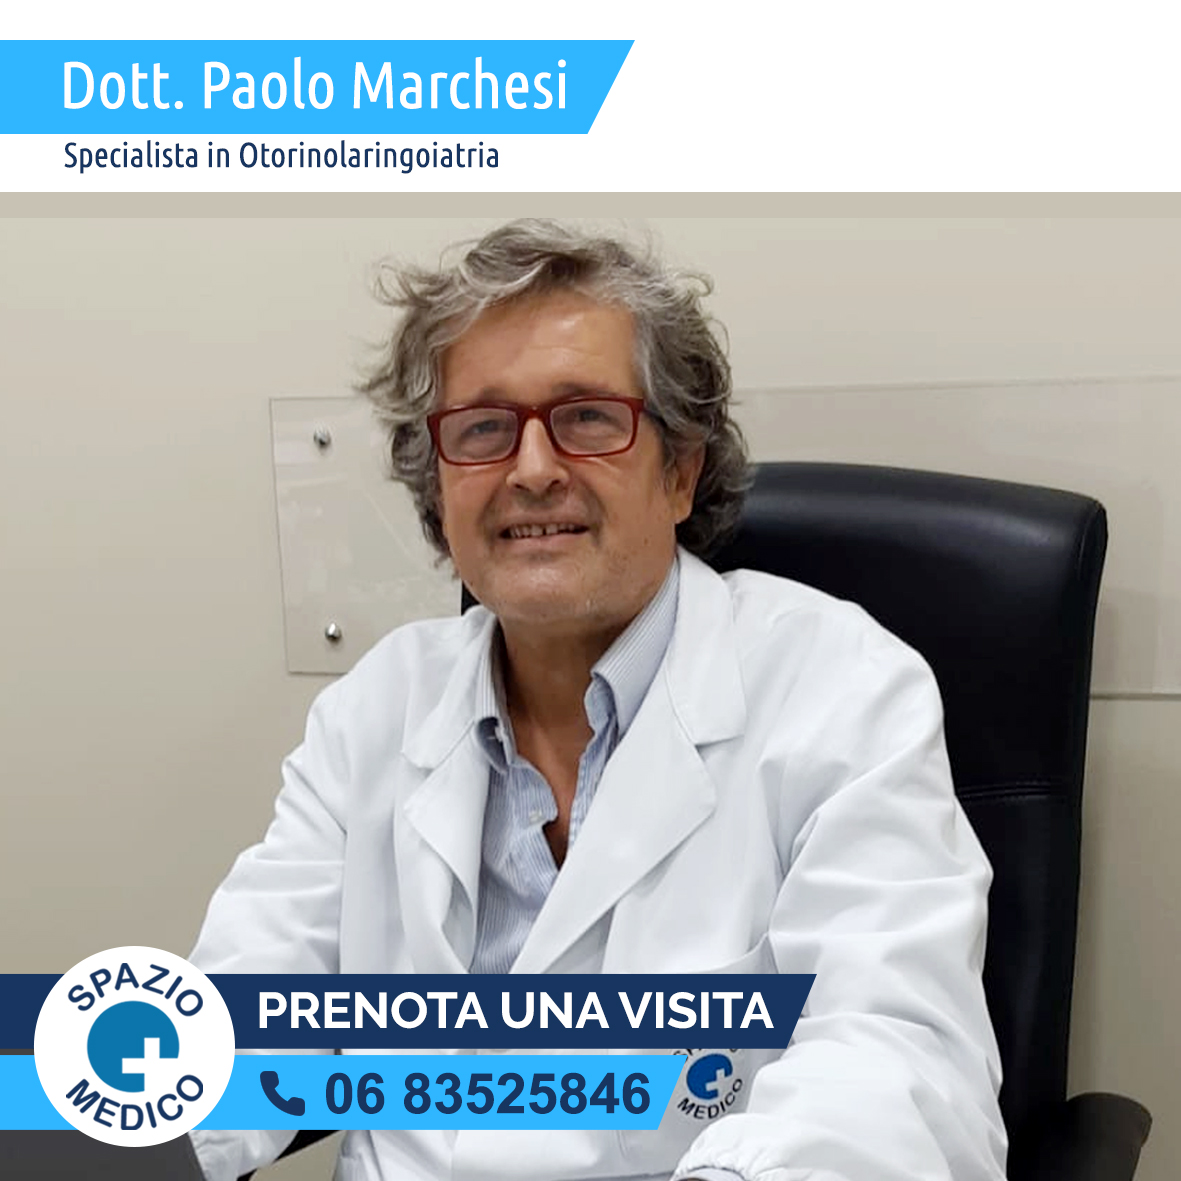 Dott-Paolo-Marchesi